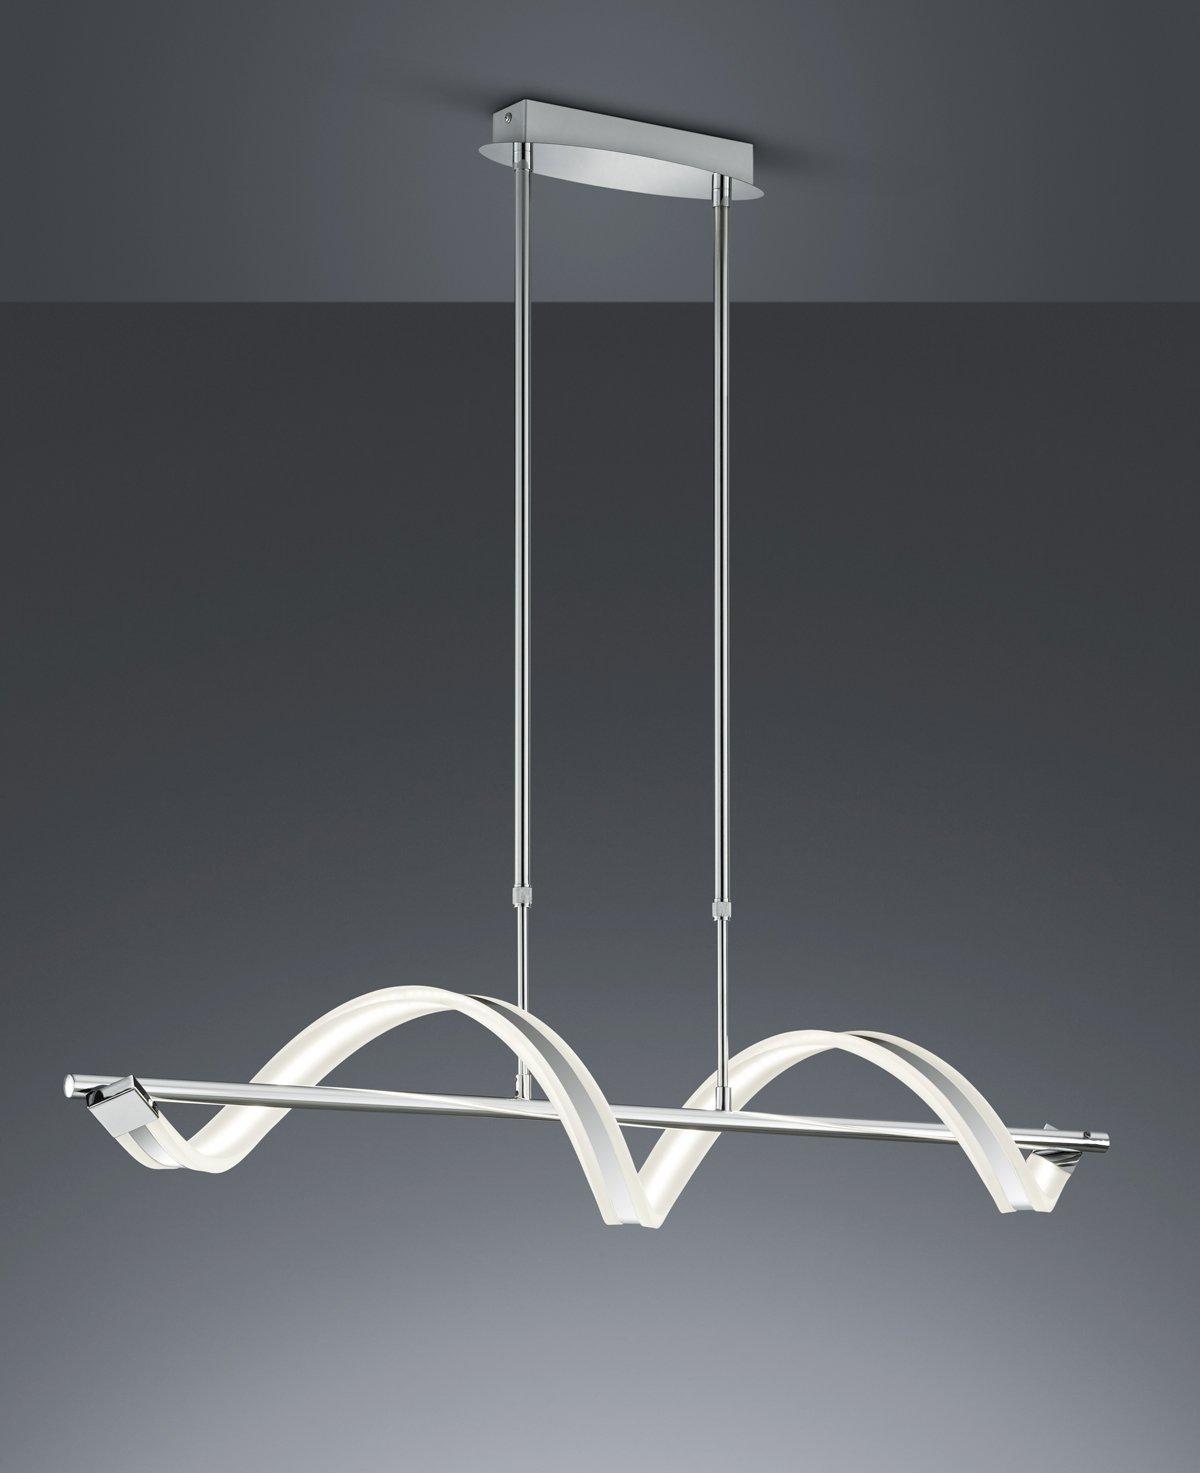 Trio Leuchten LED Stehleuchte, Acryl, Integriert, 20 20 20 W, Chrom, 25 x 25 x 162 cm 272137